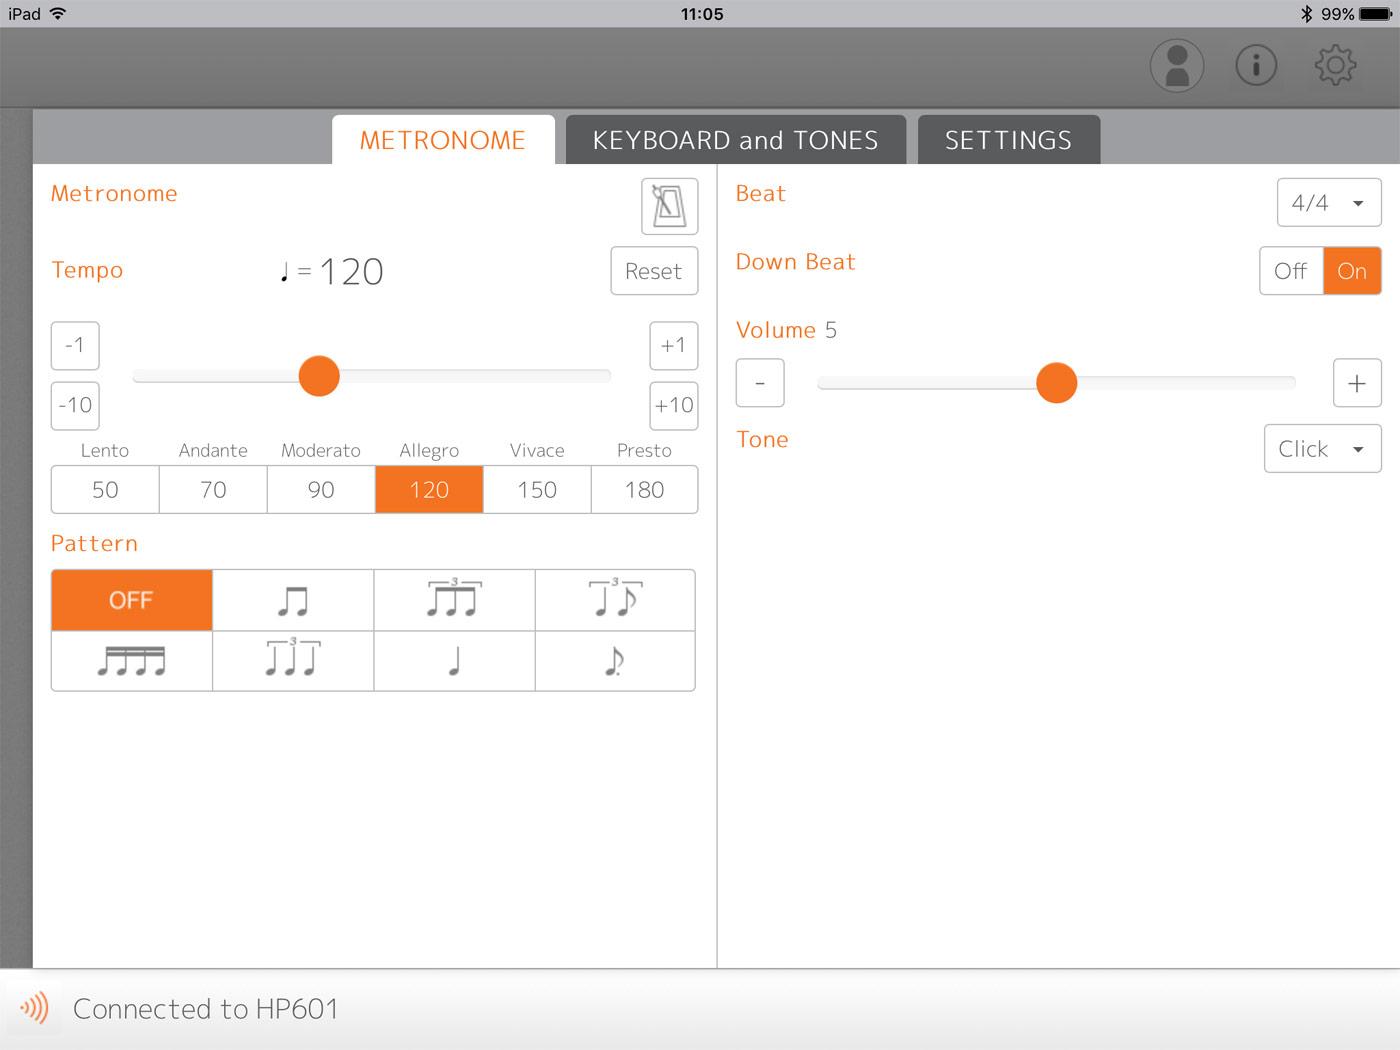 Roland - Piano Partner 2 Version 2 0 | iOS/Android App